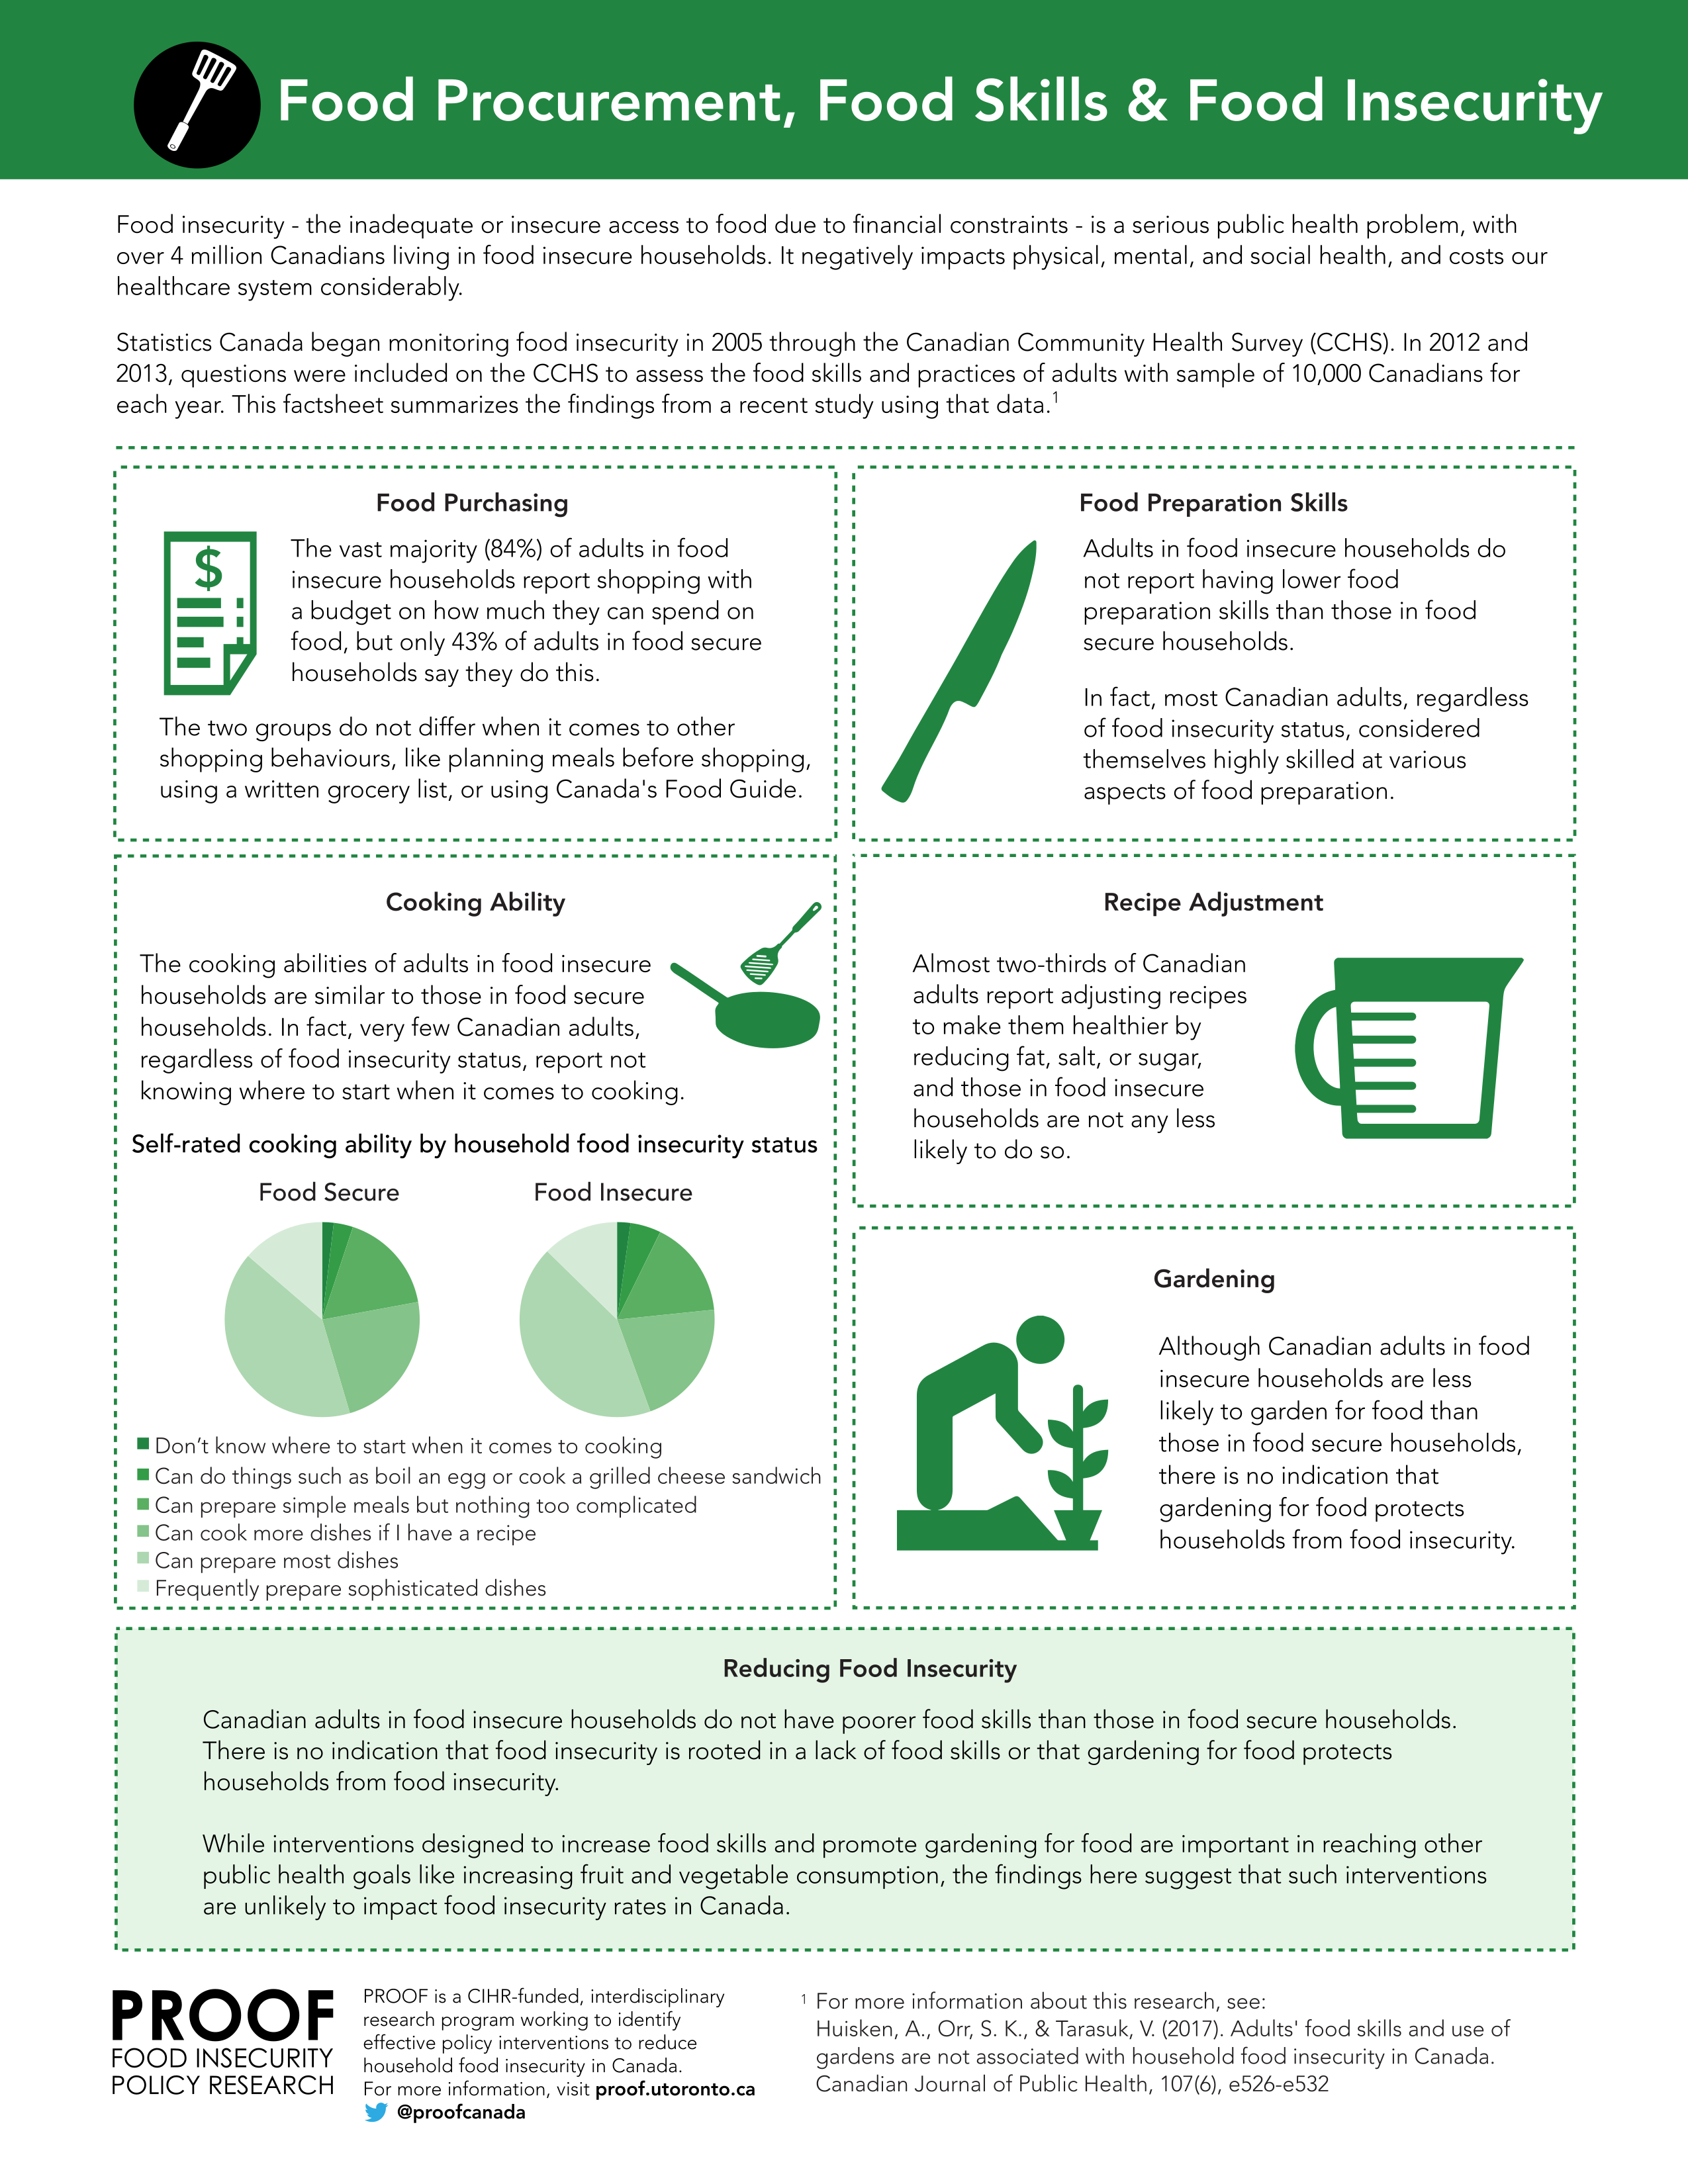 Fact Sheet: Food Procurement, Food Skills & Food Insecurity